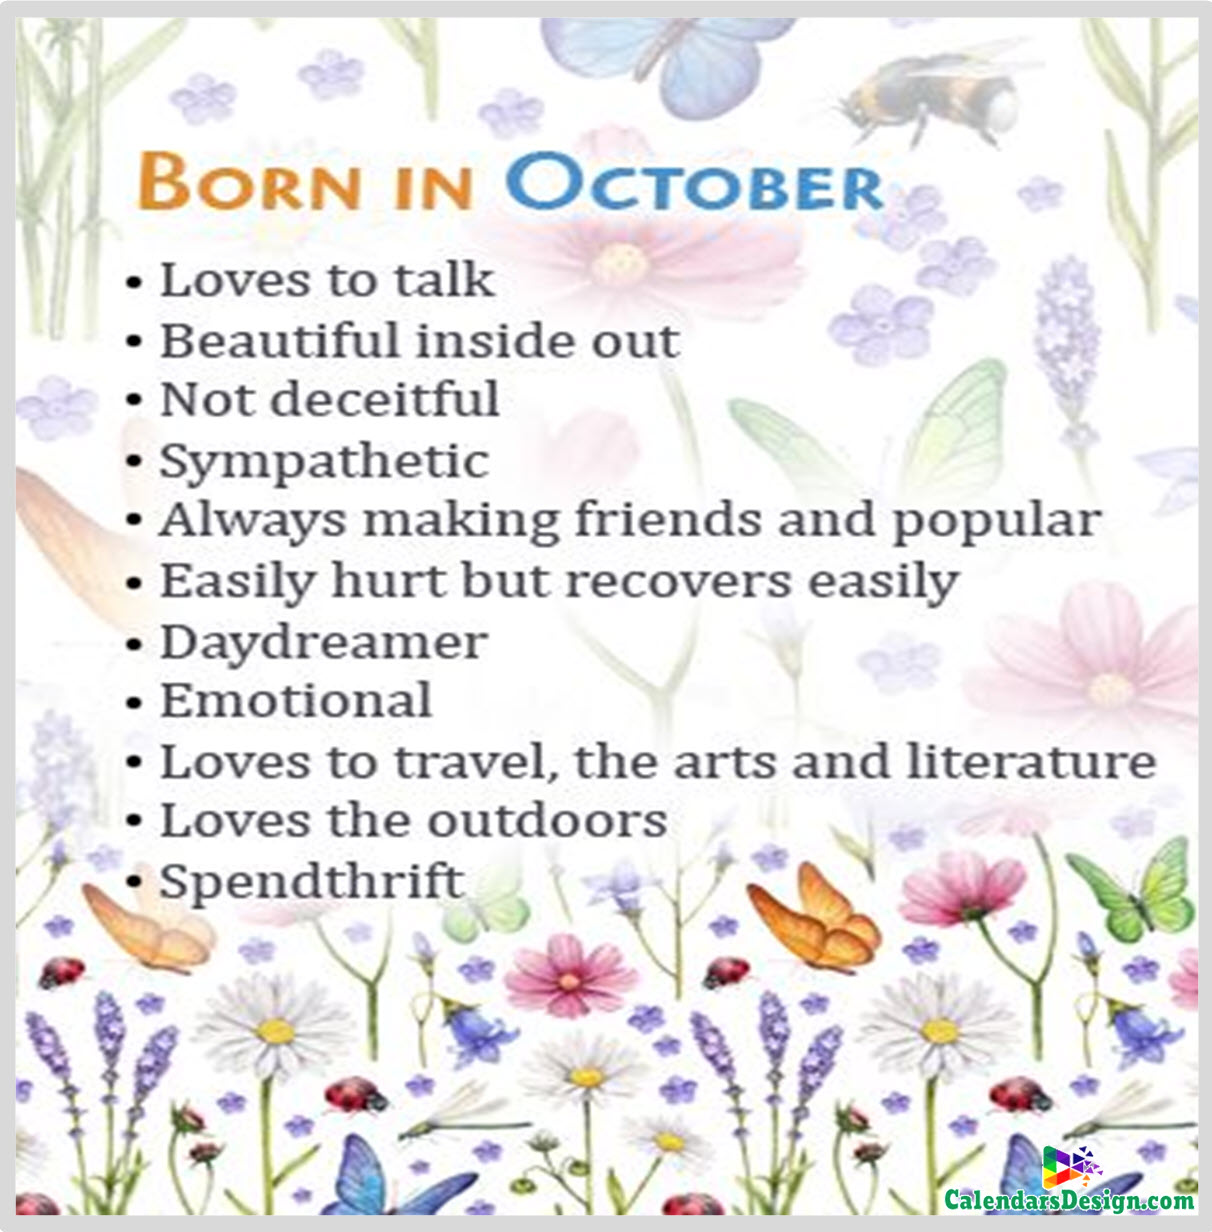 Born in October Sayings